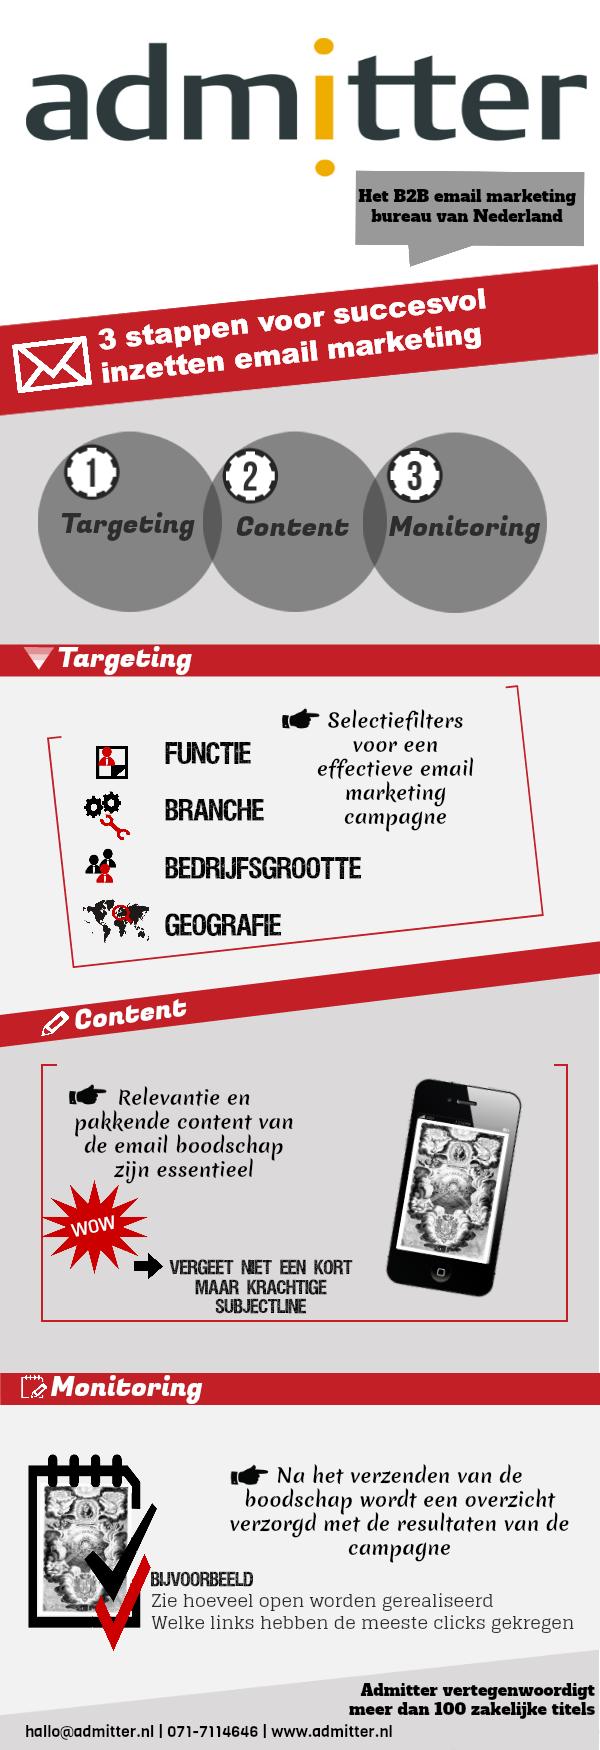 3 stappen voor succesvol inzetten email marketing [infographic]